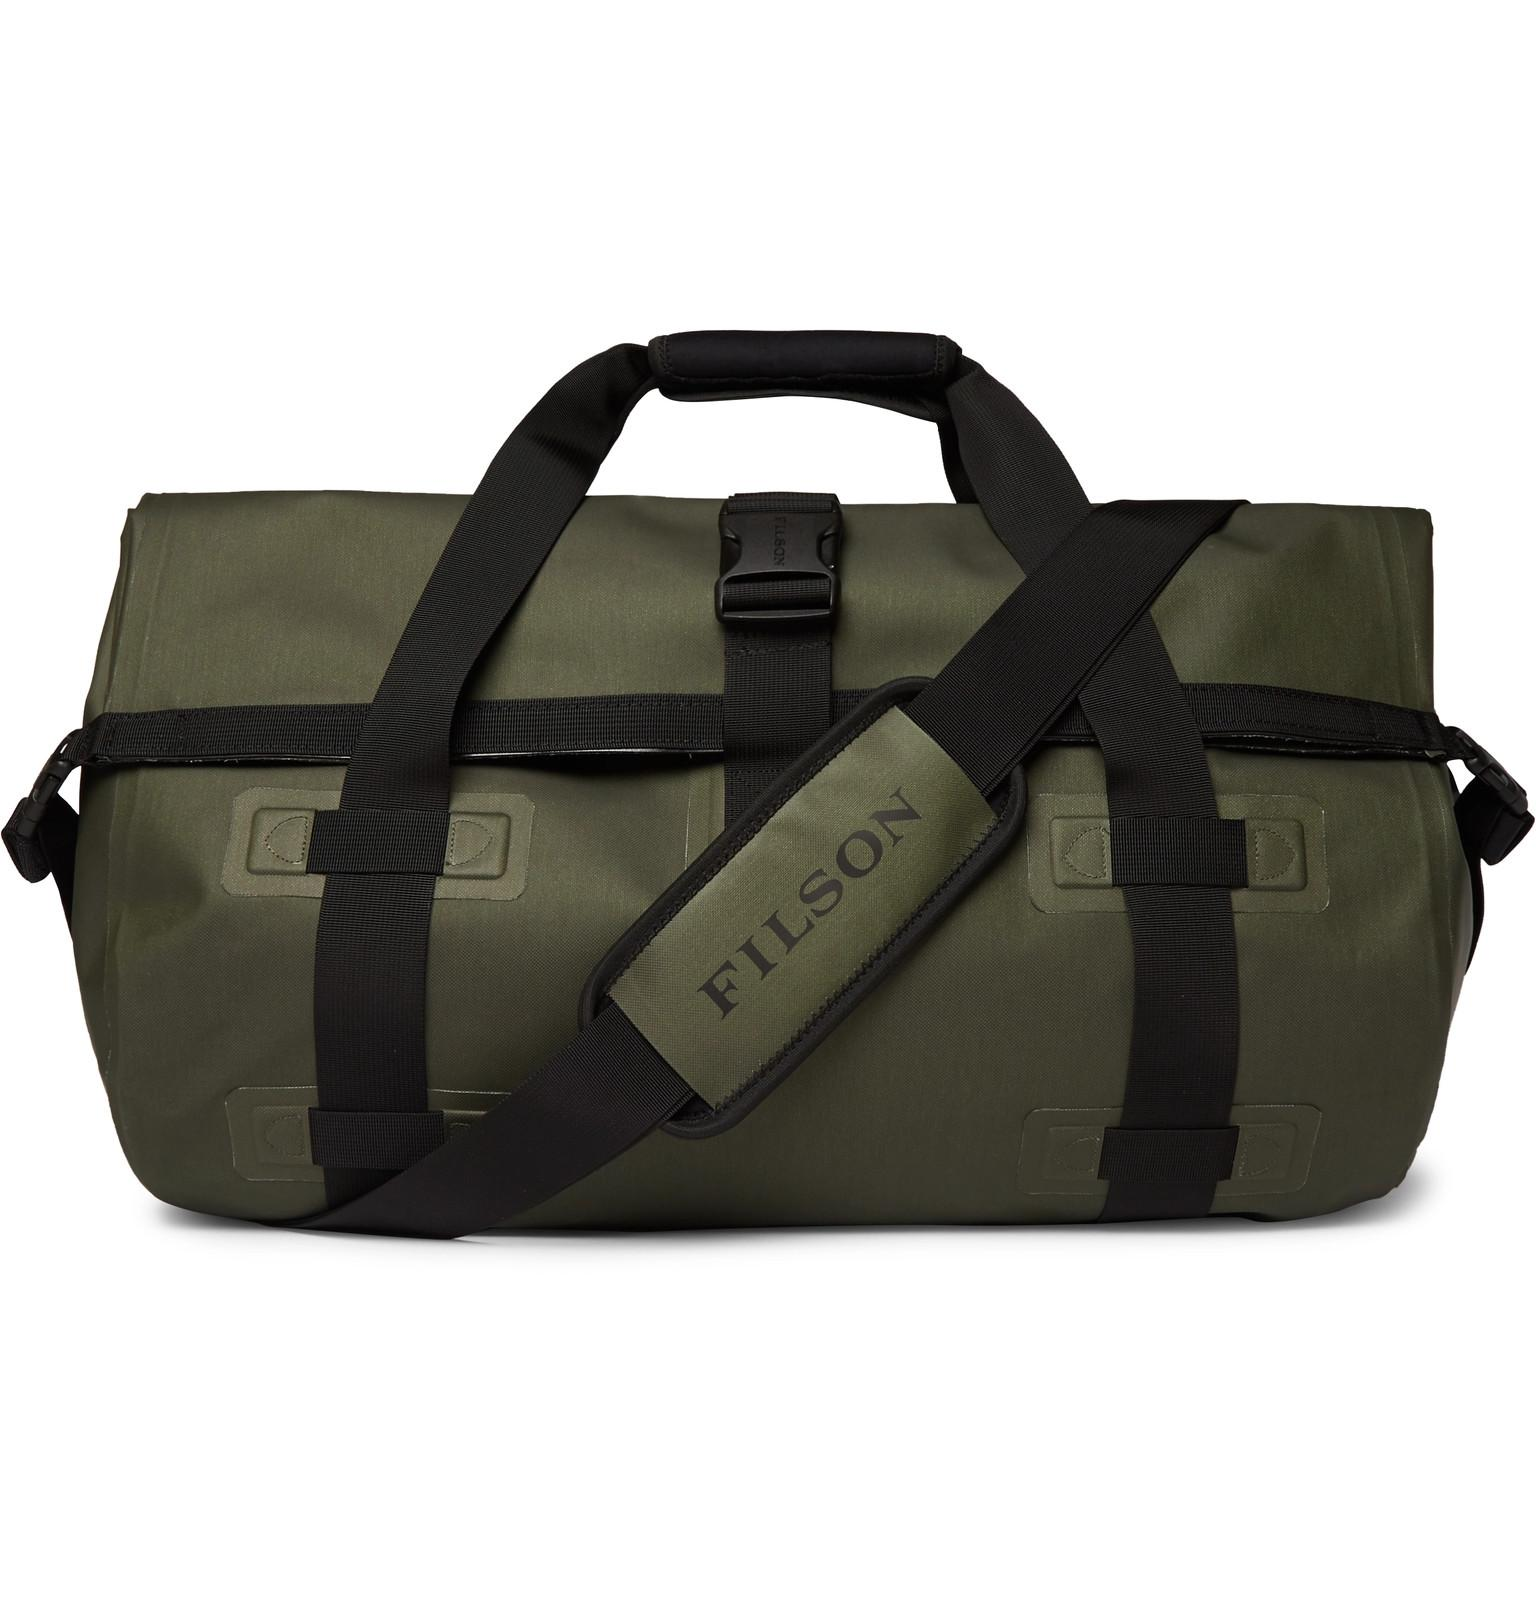 caf3cd5530 Filson - Green Dry Shell Duffle Bag for Men - Lyst. View fullscreen